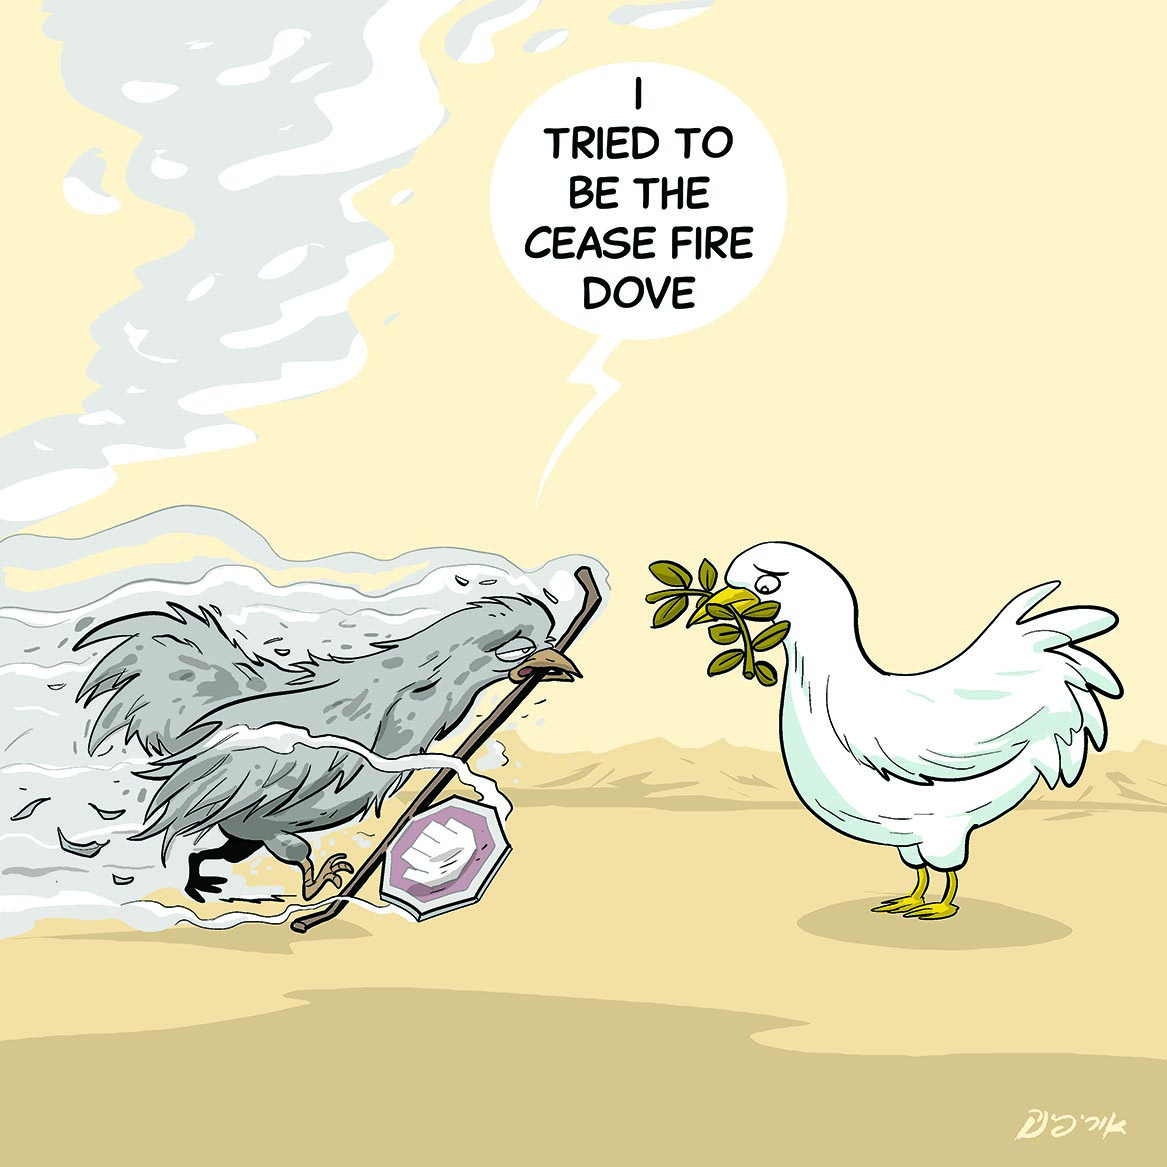 URI-FINK-cartoonist-9